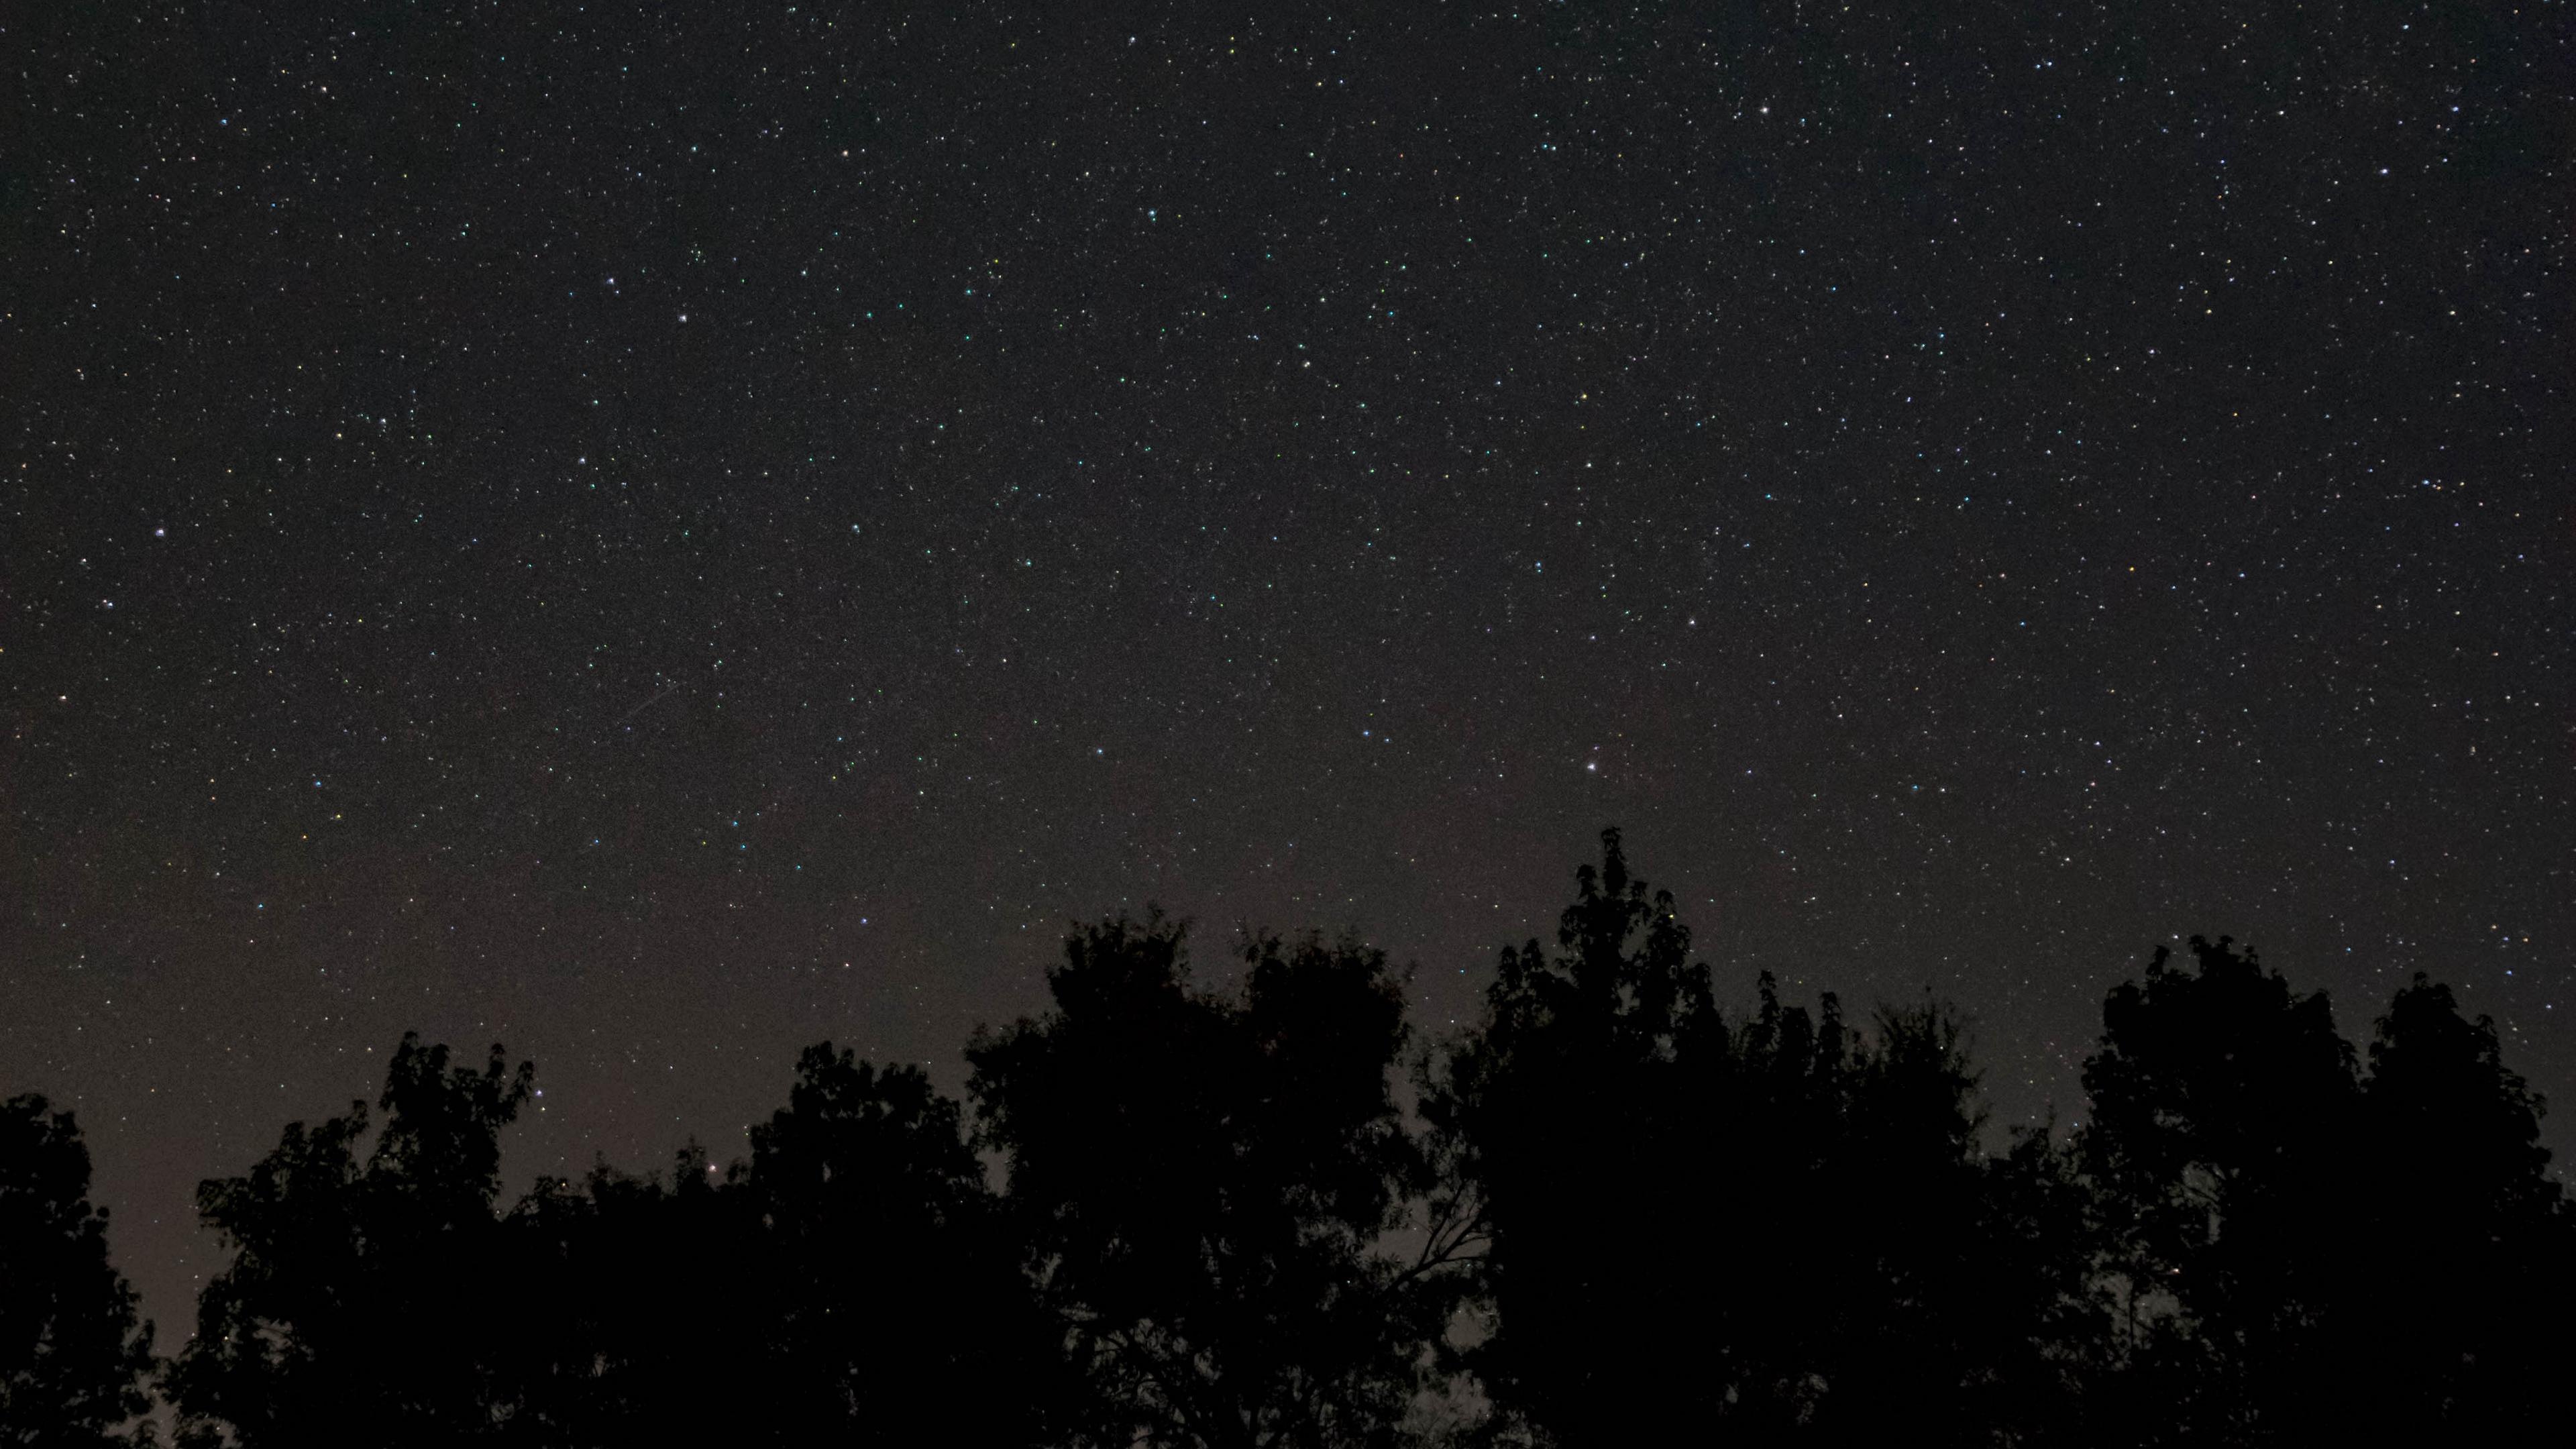 starry sky stars night trees dark 4k 1536016934 - starry sky, stars, night, trees, dark 4k - Stars, starry sky, Night